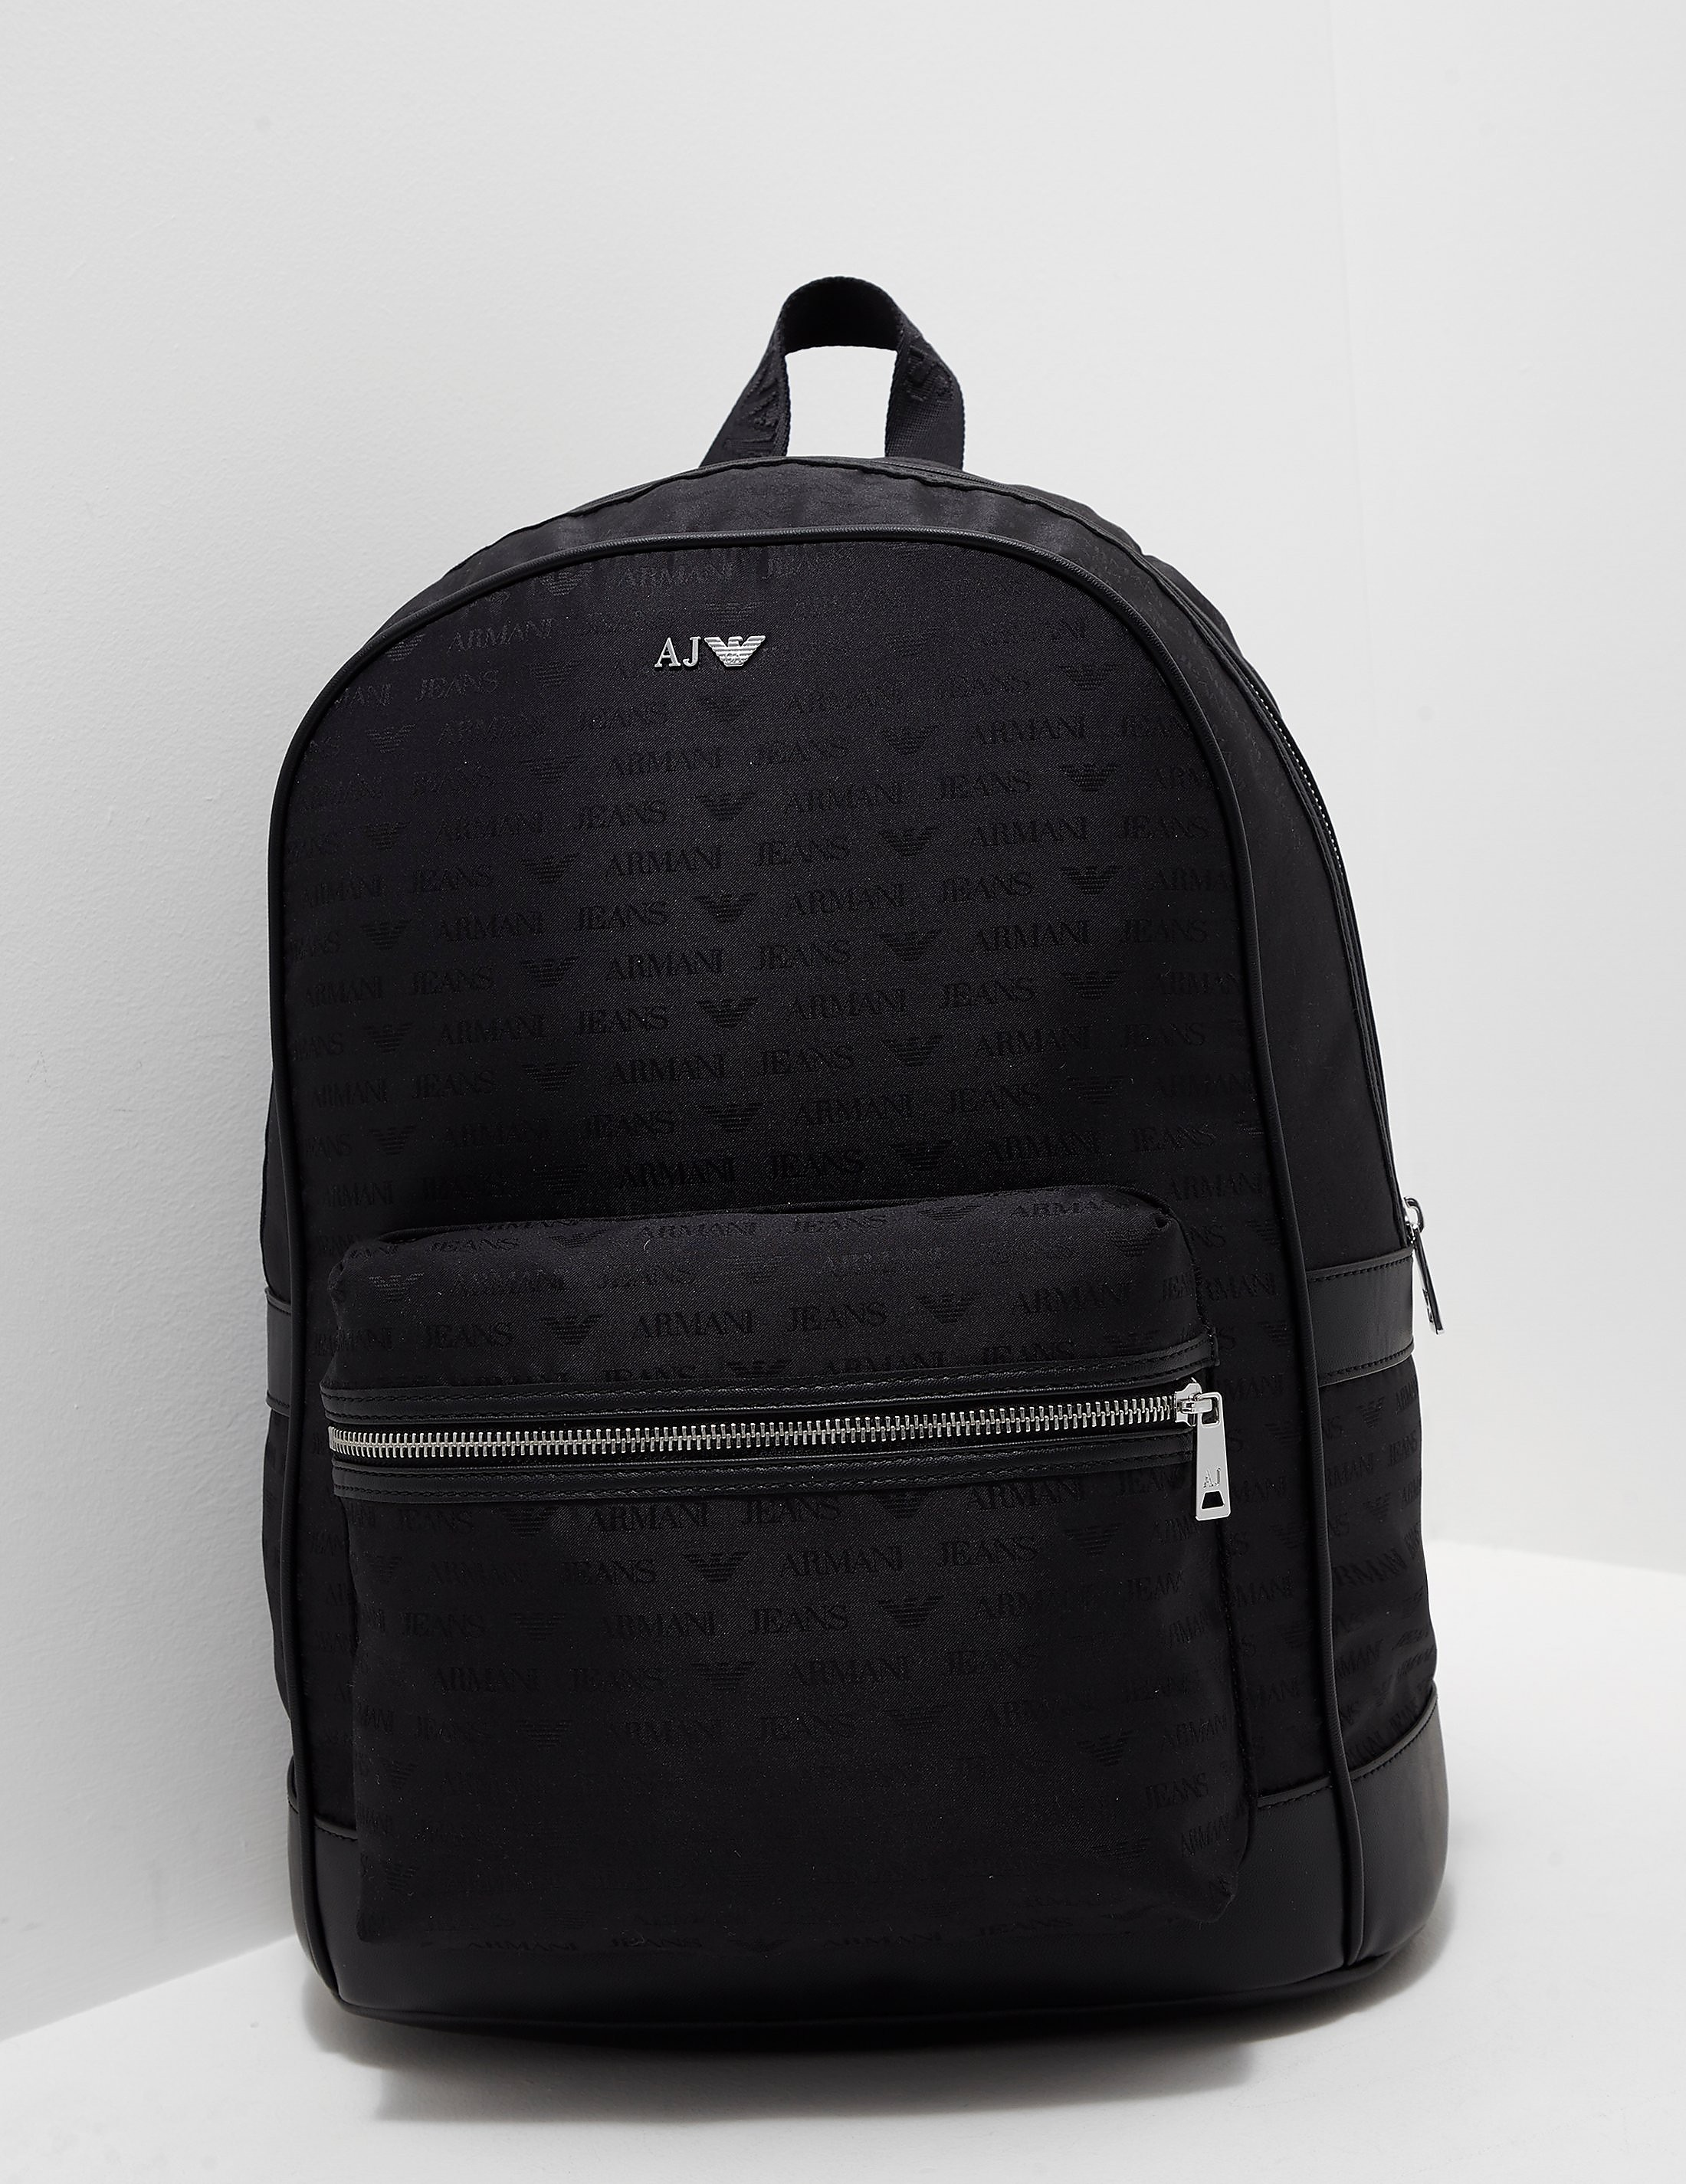 Armani Jeans Nylon Backpack